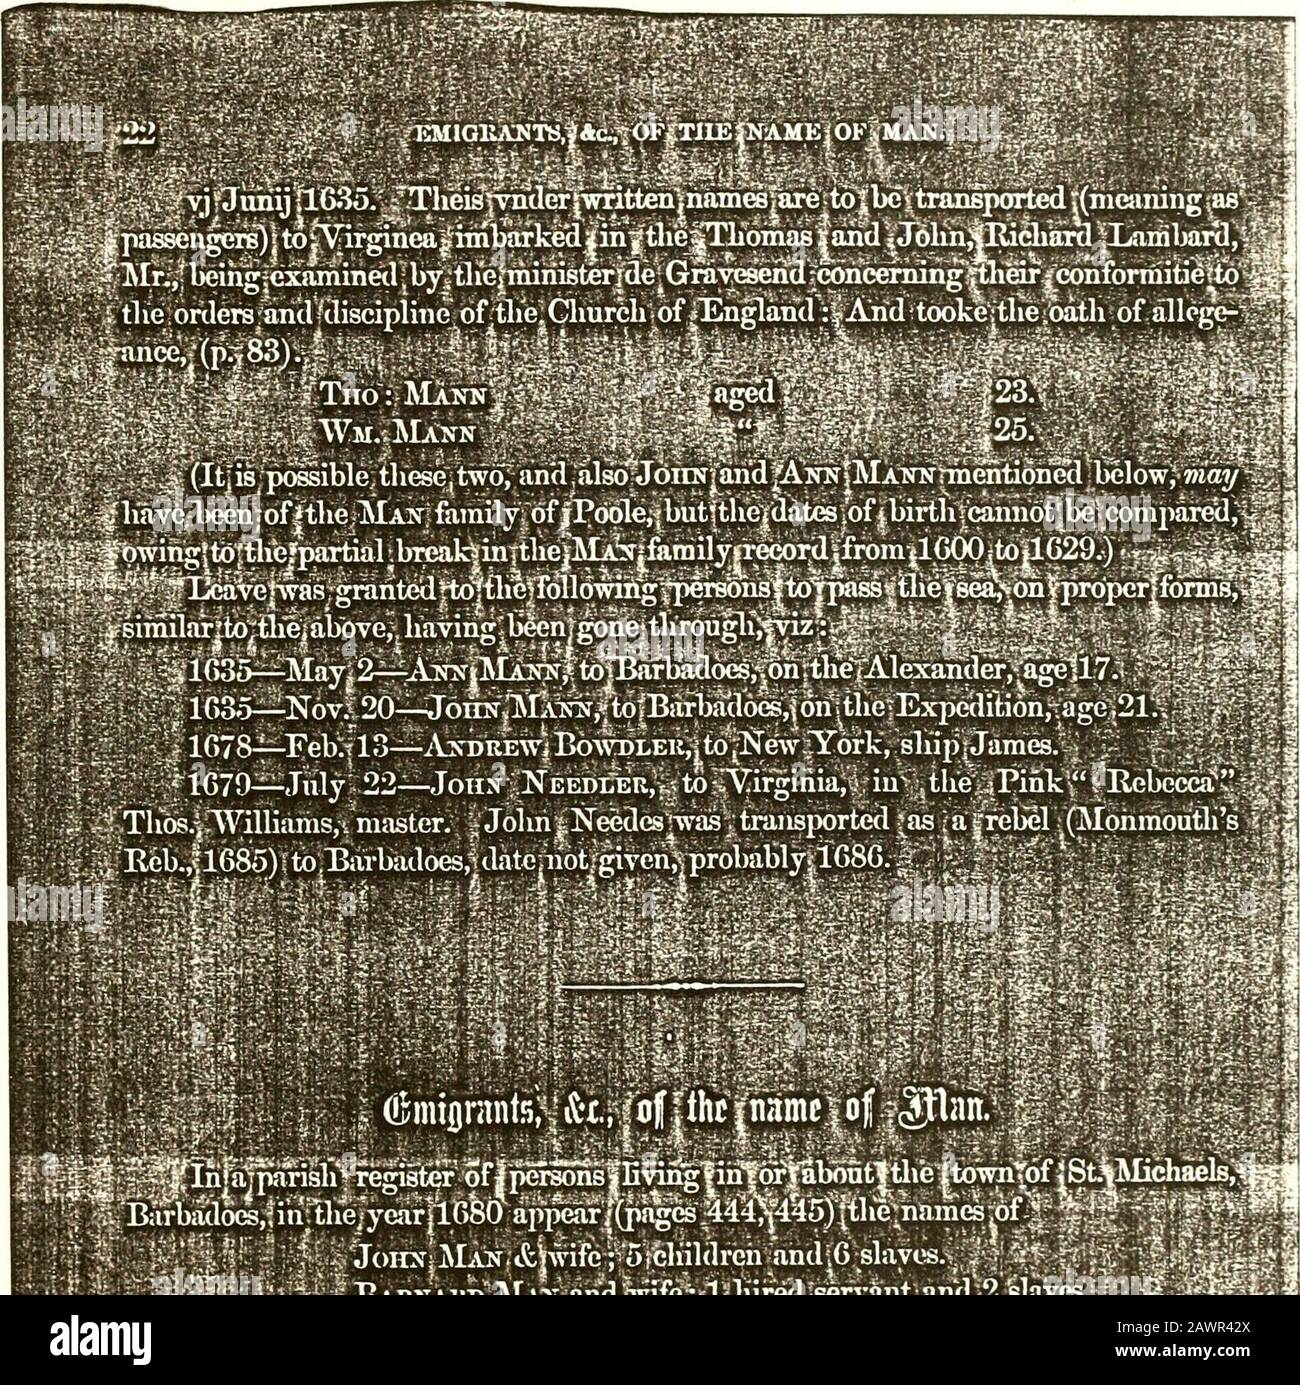 Record des familles de Man, Needles (Nedels) et Hambleton...1495-1876 . 1.1/, À J.-ail C 1.1 .III ^ HllV/ij =-*. Ji yp~ga ? :TIIK IMaST* FAMIY|in |NEW|ENGlU>n>.: TF-proof/of fcl .-SKftB ppointe^jJohni|Manne/|Genk^to^i nandjof|3aTnaic^le^namvvvvvvvvvmby|]iet6gt,^ifjngfhfhfhfhfhfhfhfhfhfhfhfhfhfhfhfhfhfhfhfhfhfhfhfhfhfhfhfhfhfhfhfhfhfhfhfhfhfhfhfhfhfhfhfhfhfhfhfhfhfhfhfhfhfhfhfhfhfhfhfhfhfhfhfhfhfhfhfhf : Il| isfmeritiohed j^as .oijieifof jthe| Survey ois^of Eehobotli^Jiine 9,^1(383^1 Mo..aiidas ayant Banque D'Images